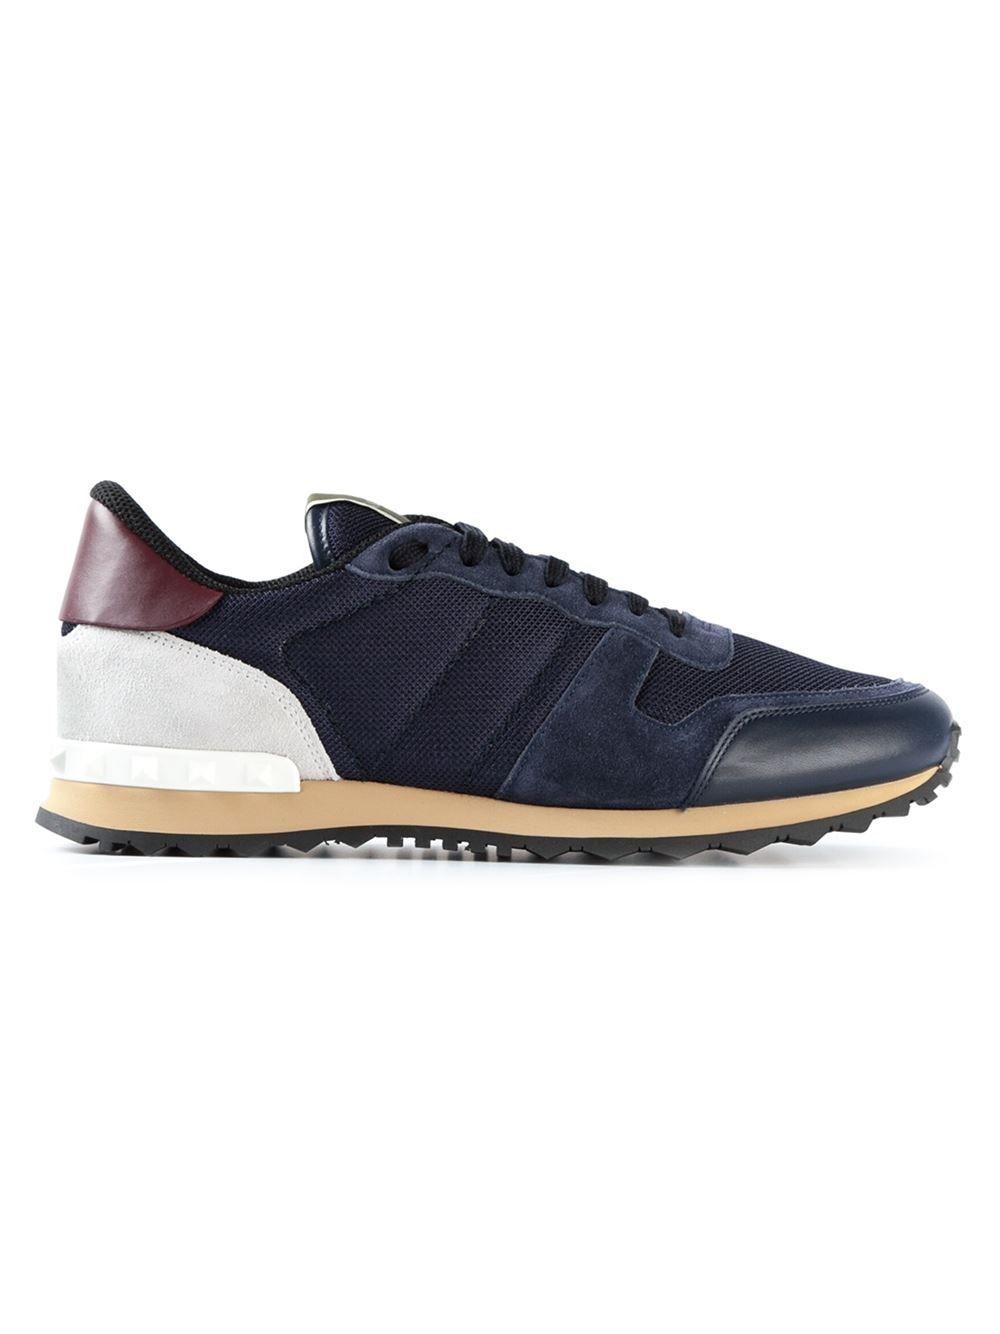 24a90dcb1 Shop the latest men's designer Shoes at Farfetch now. Valentino Garavani  'rockrunner' Sneakers - Papini - Farfetch.com